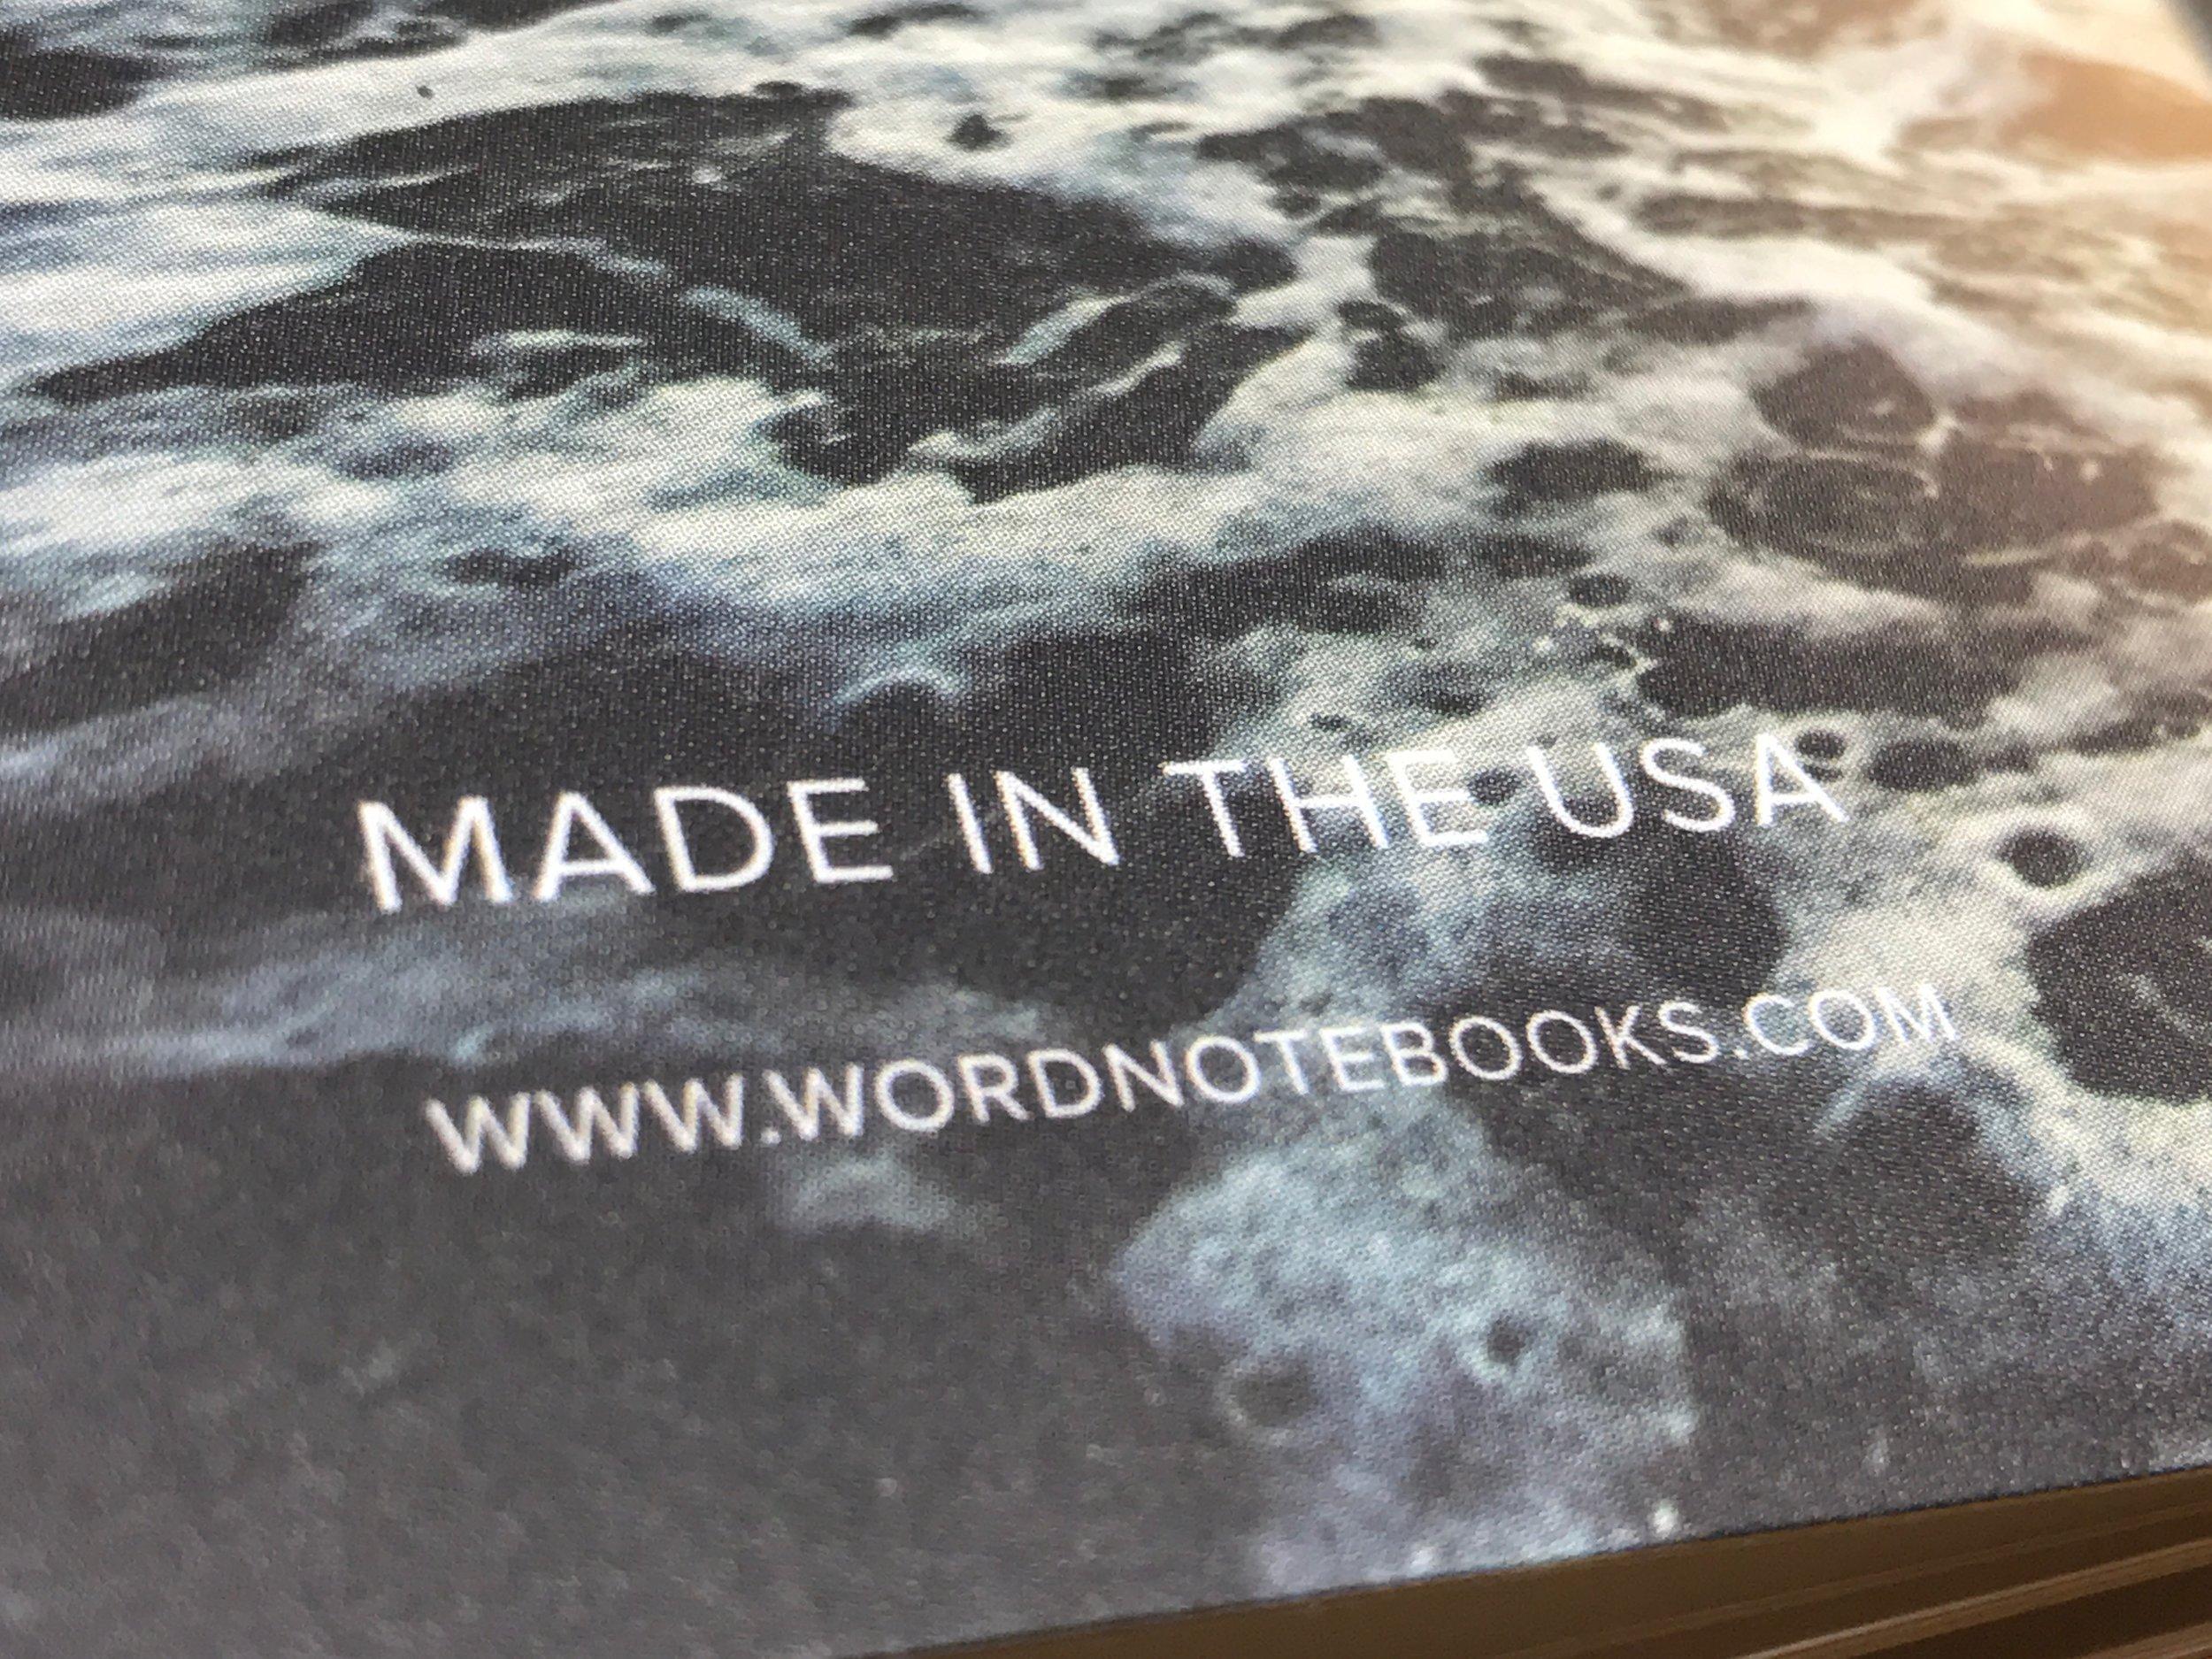 word-notebooks-beach-vibes-10.jpg